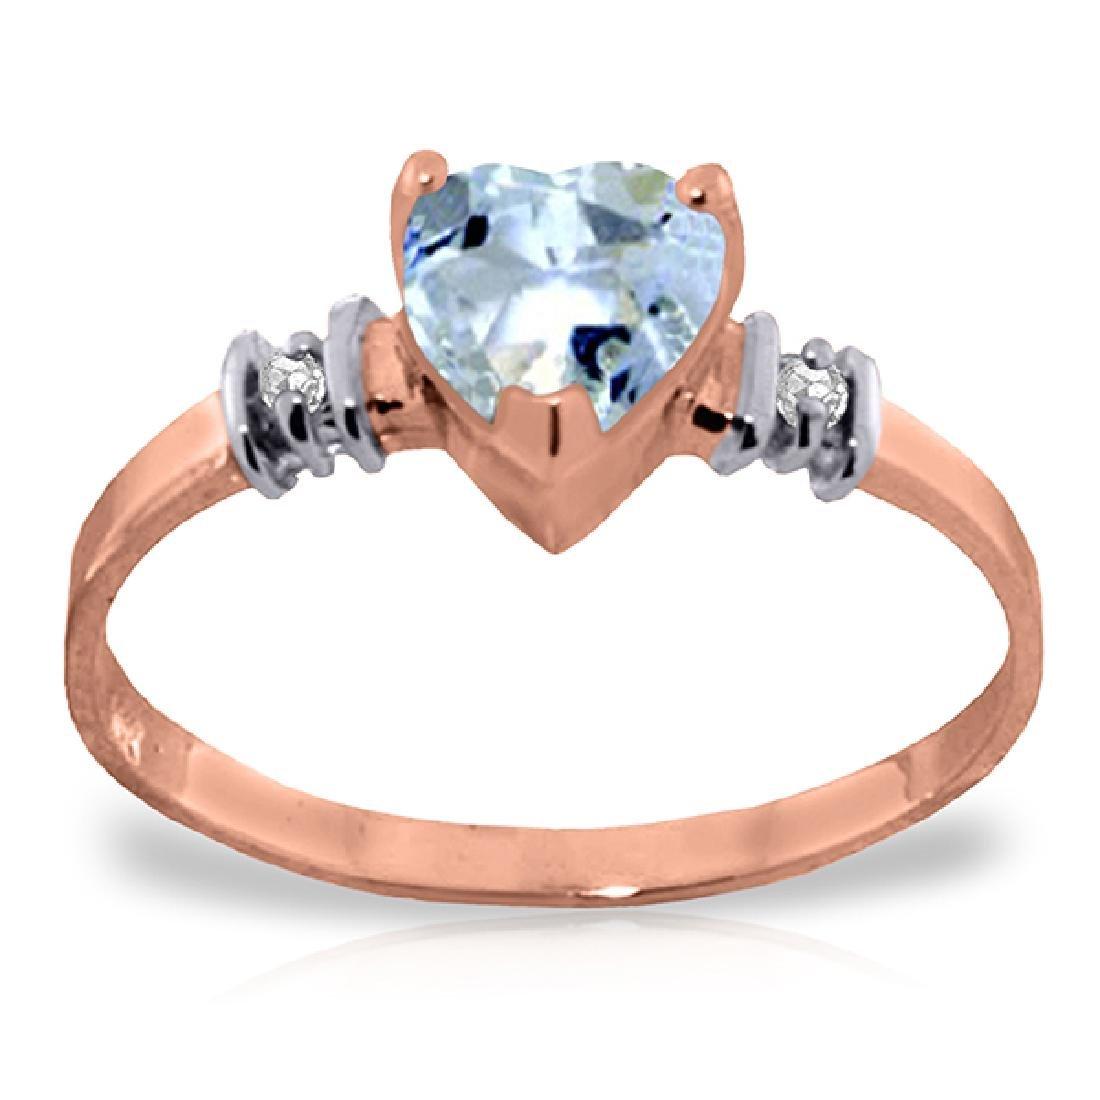 Genuine 0.98 ctw Aquamarine & Diamond Ring Jewelry 14KT